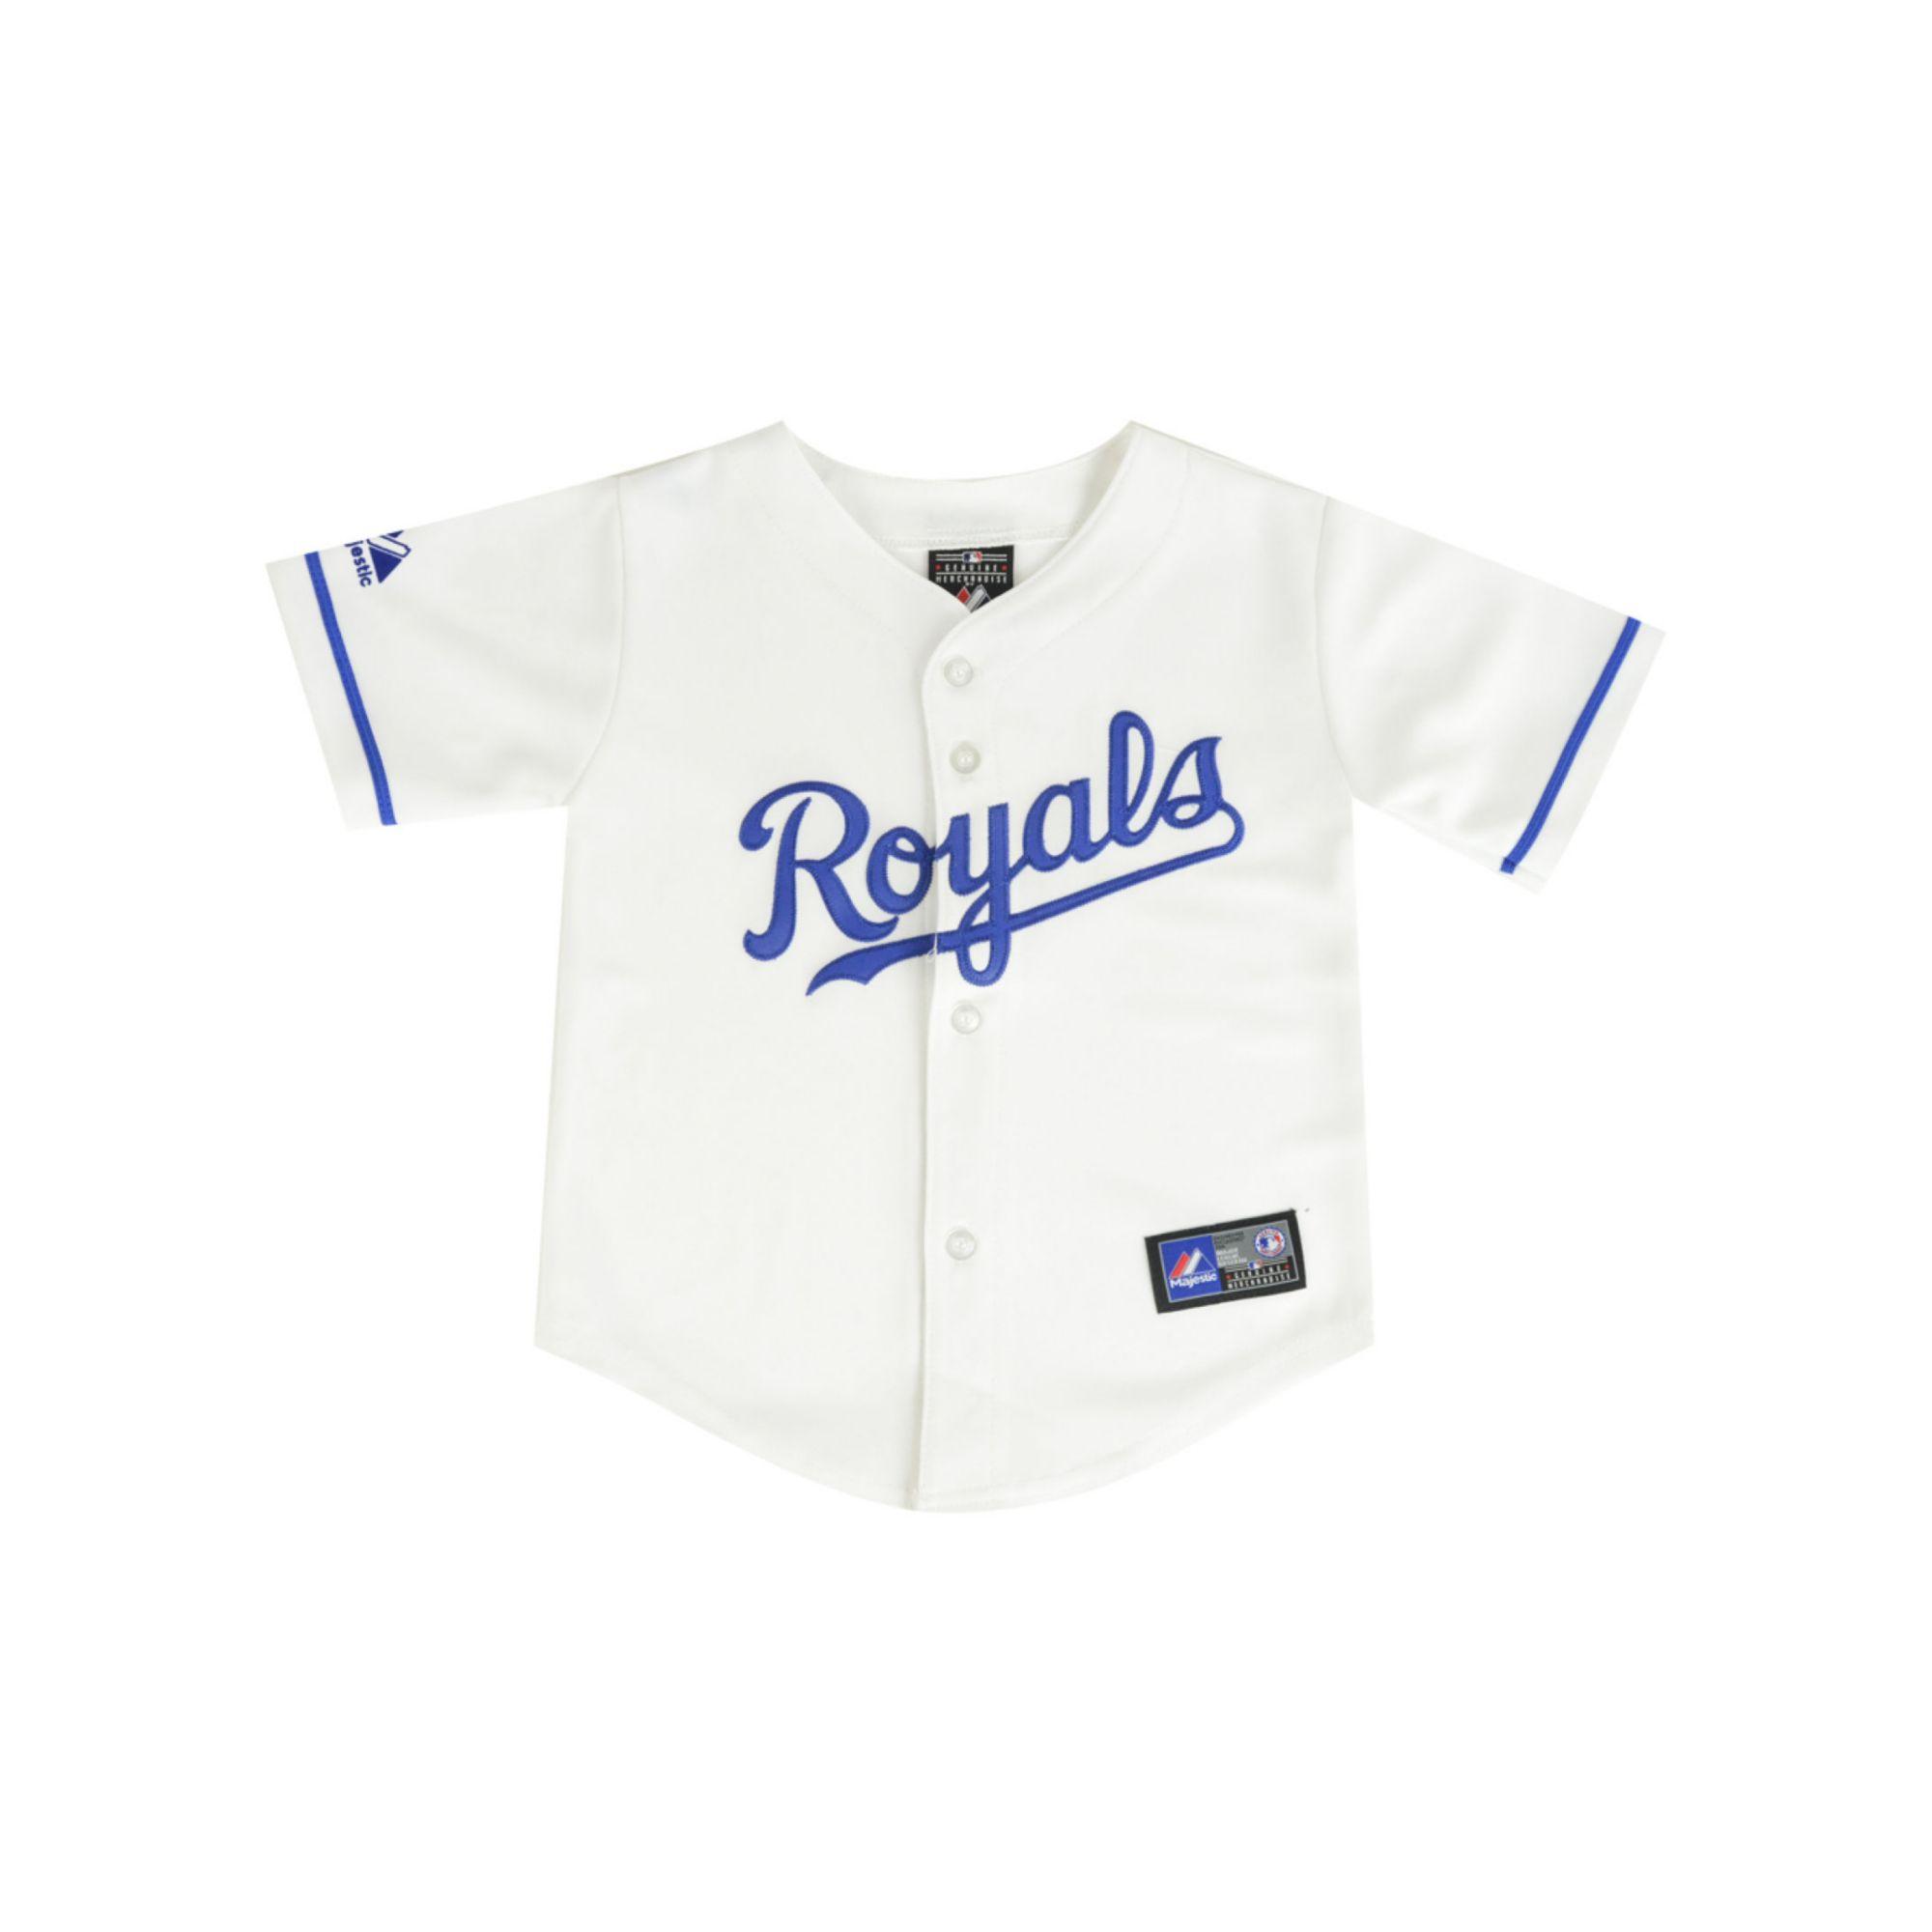 big sale b8ecf 7055d Lyst - Majestic Toddler Boys Kansas City Royals Blank ...